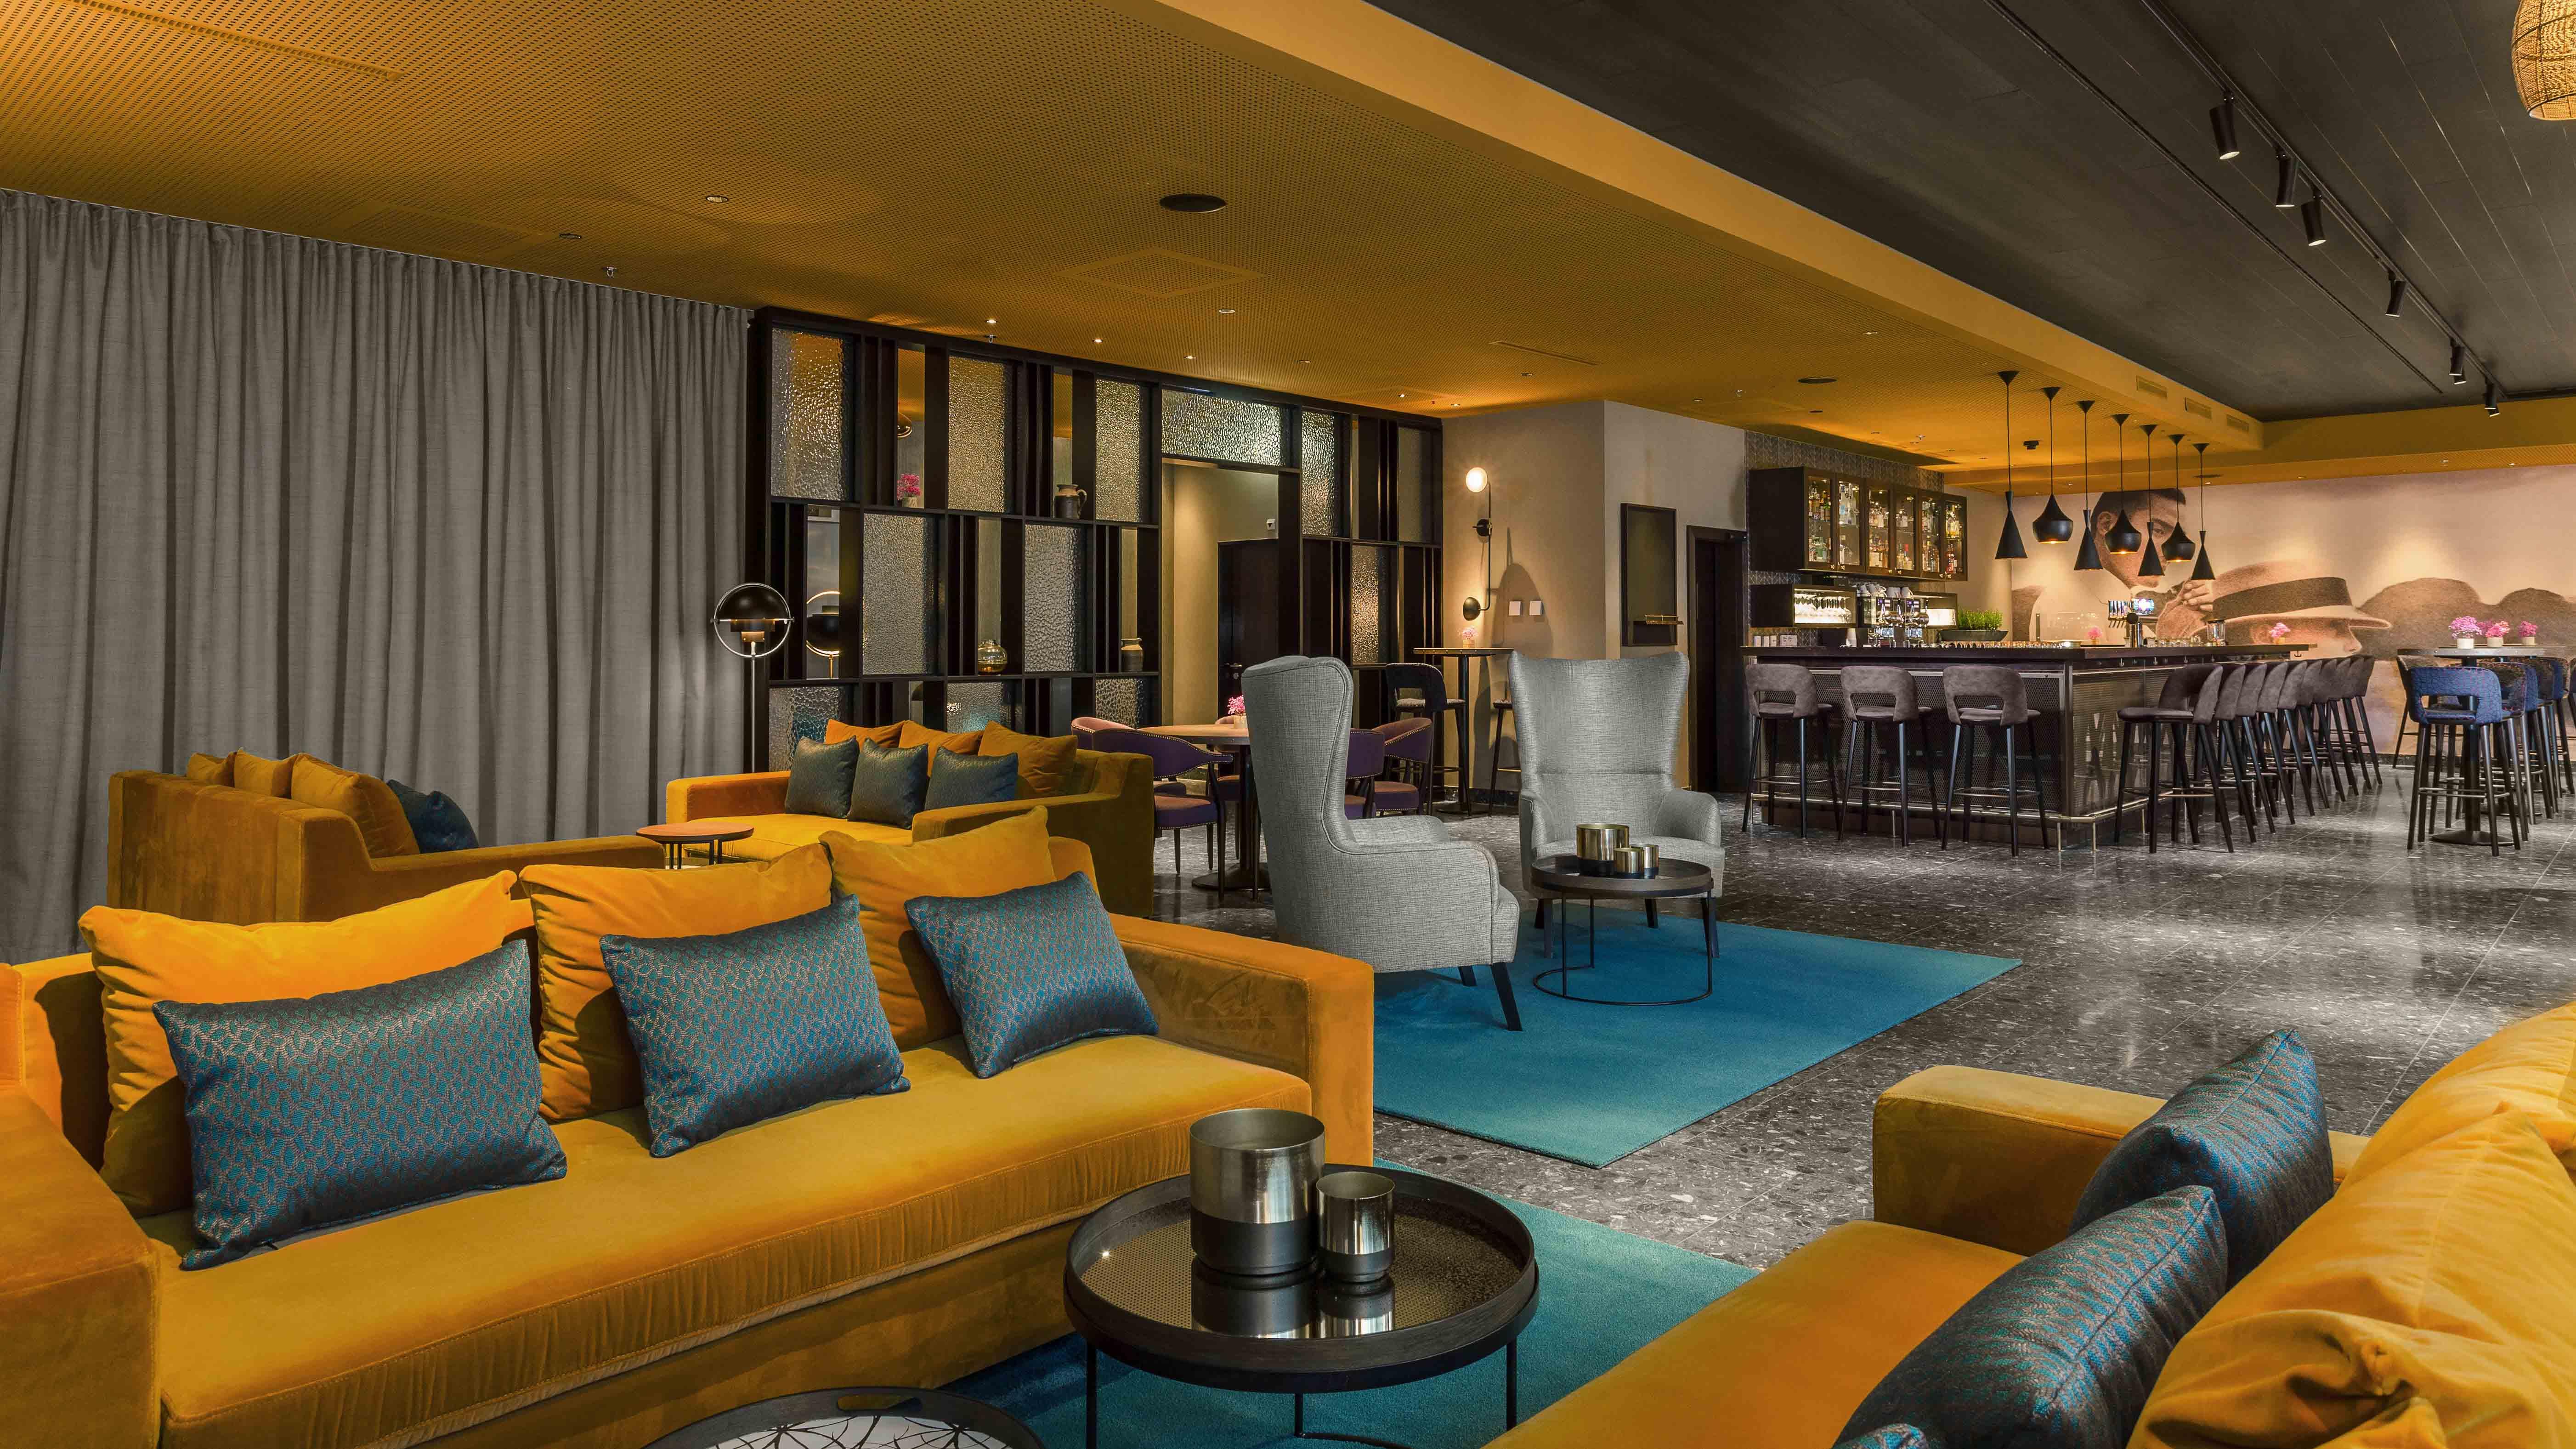 https://www.hotelsbyday.com/_data/default-hotel_image/2/12989/l-amant-bar-loung.jpg